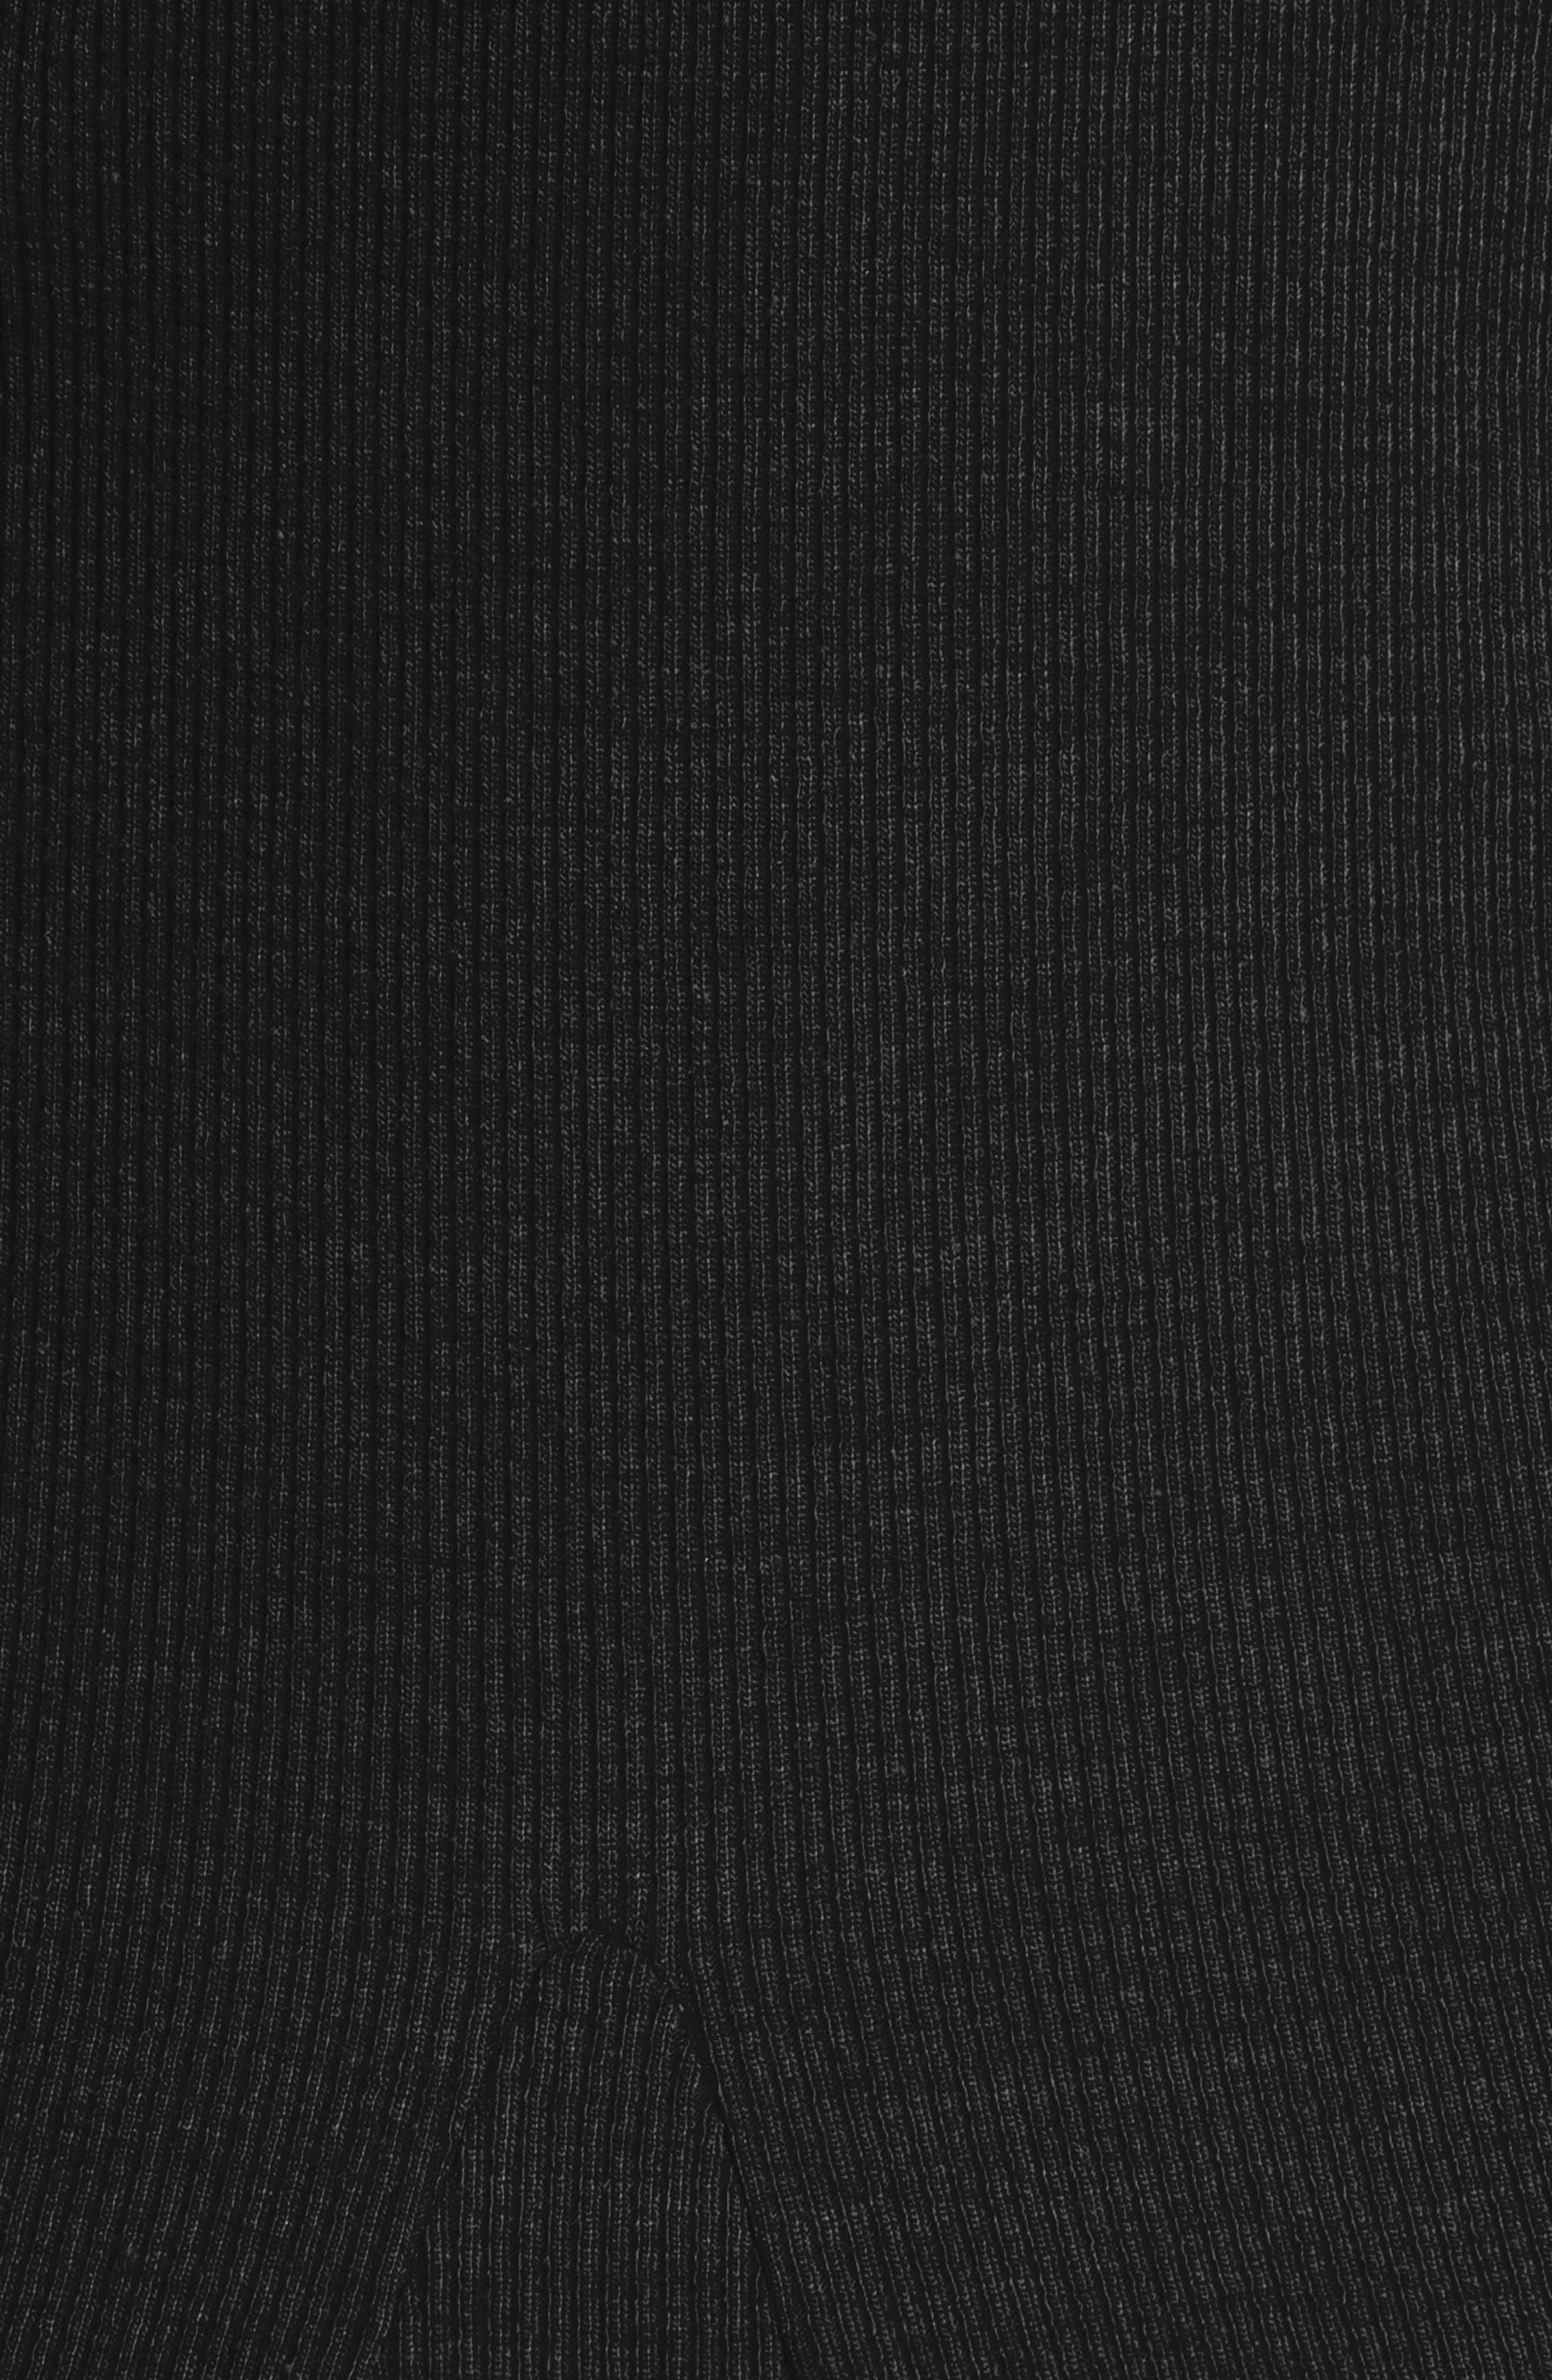 Dione One-Shoulder Dress,                             Alternate thumbnail 6, color,